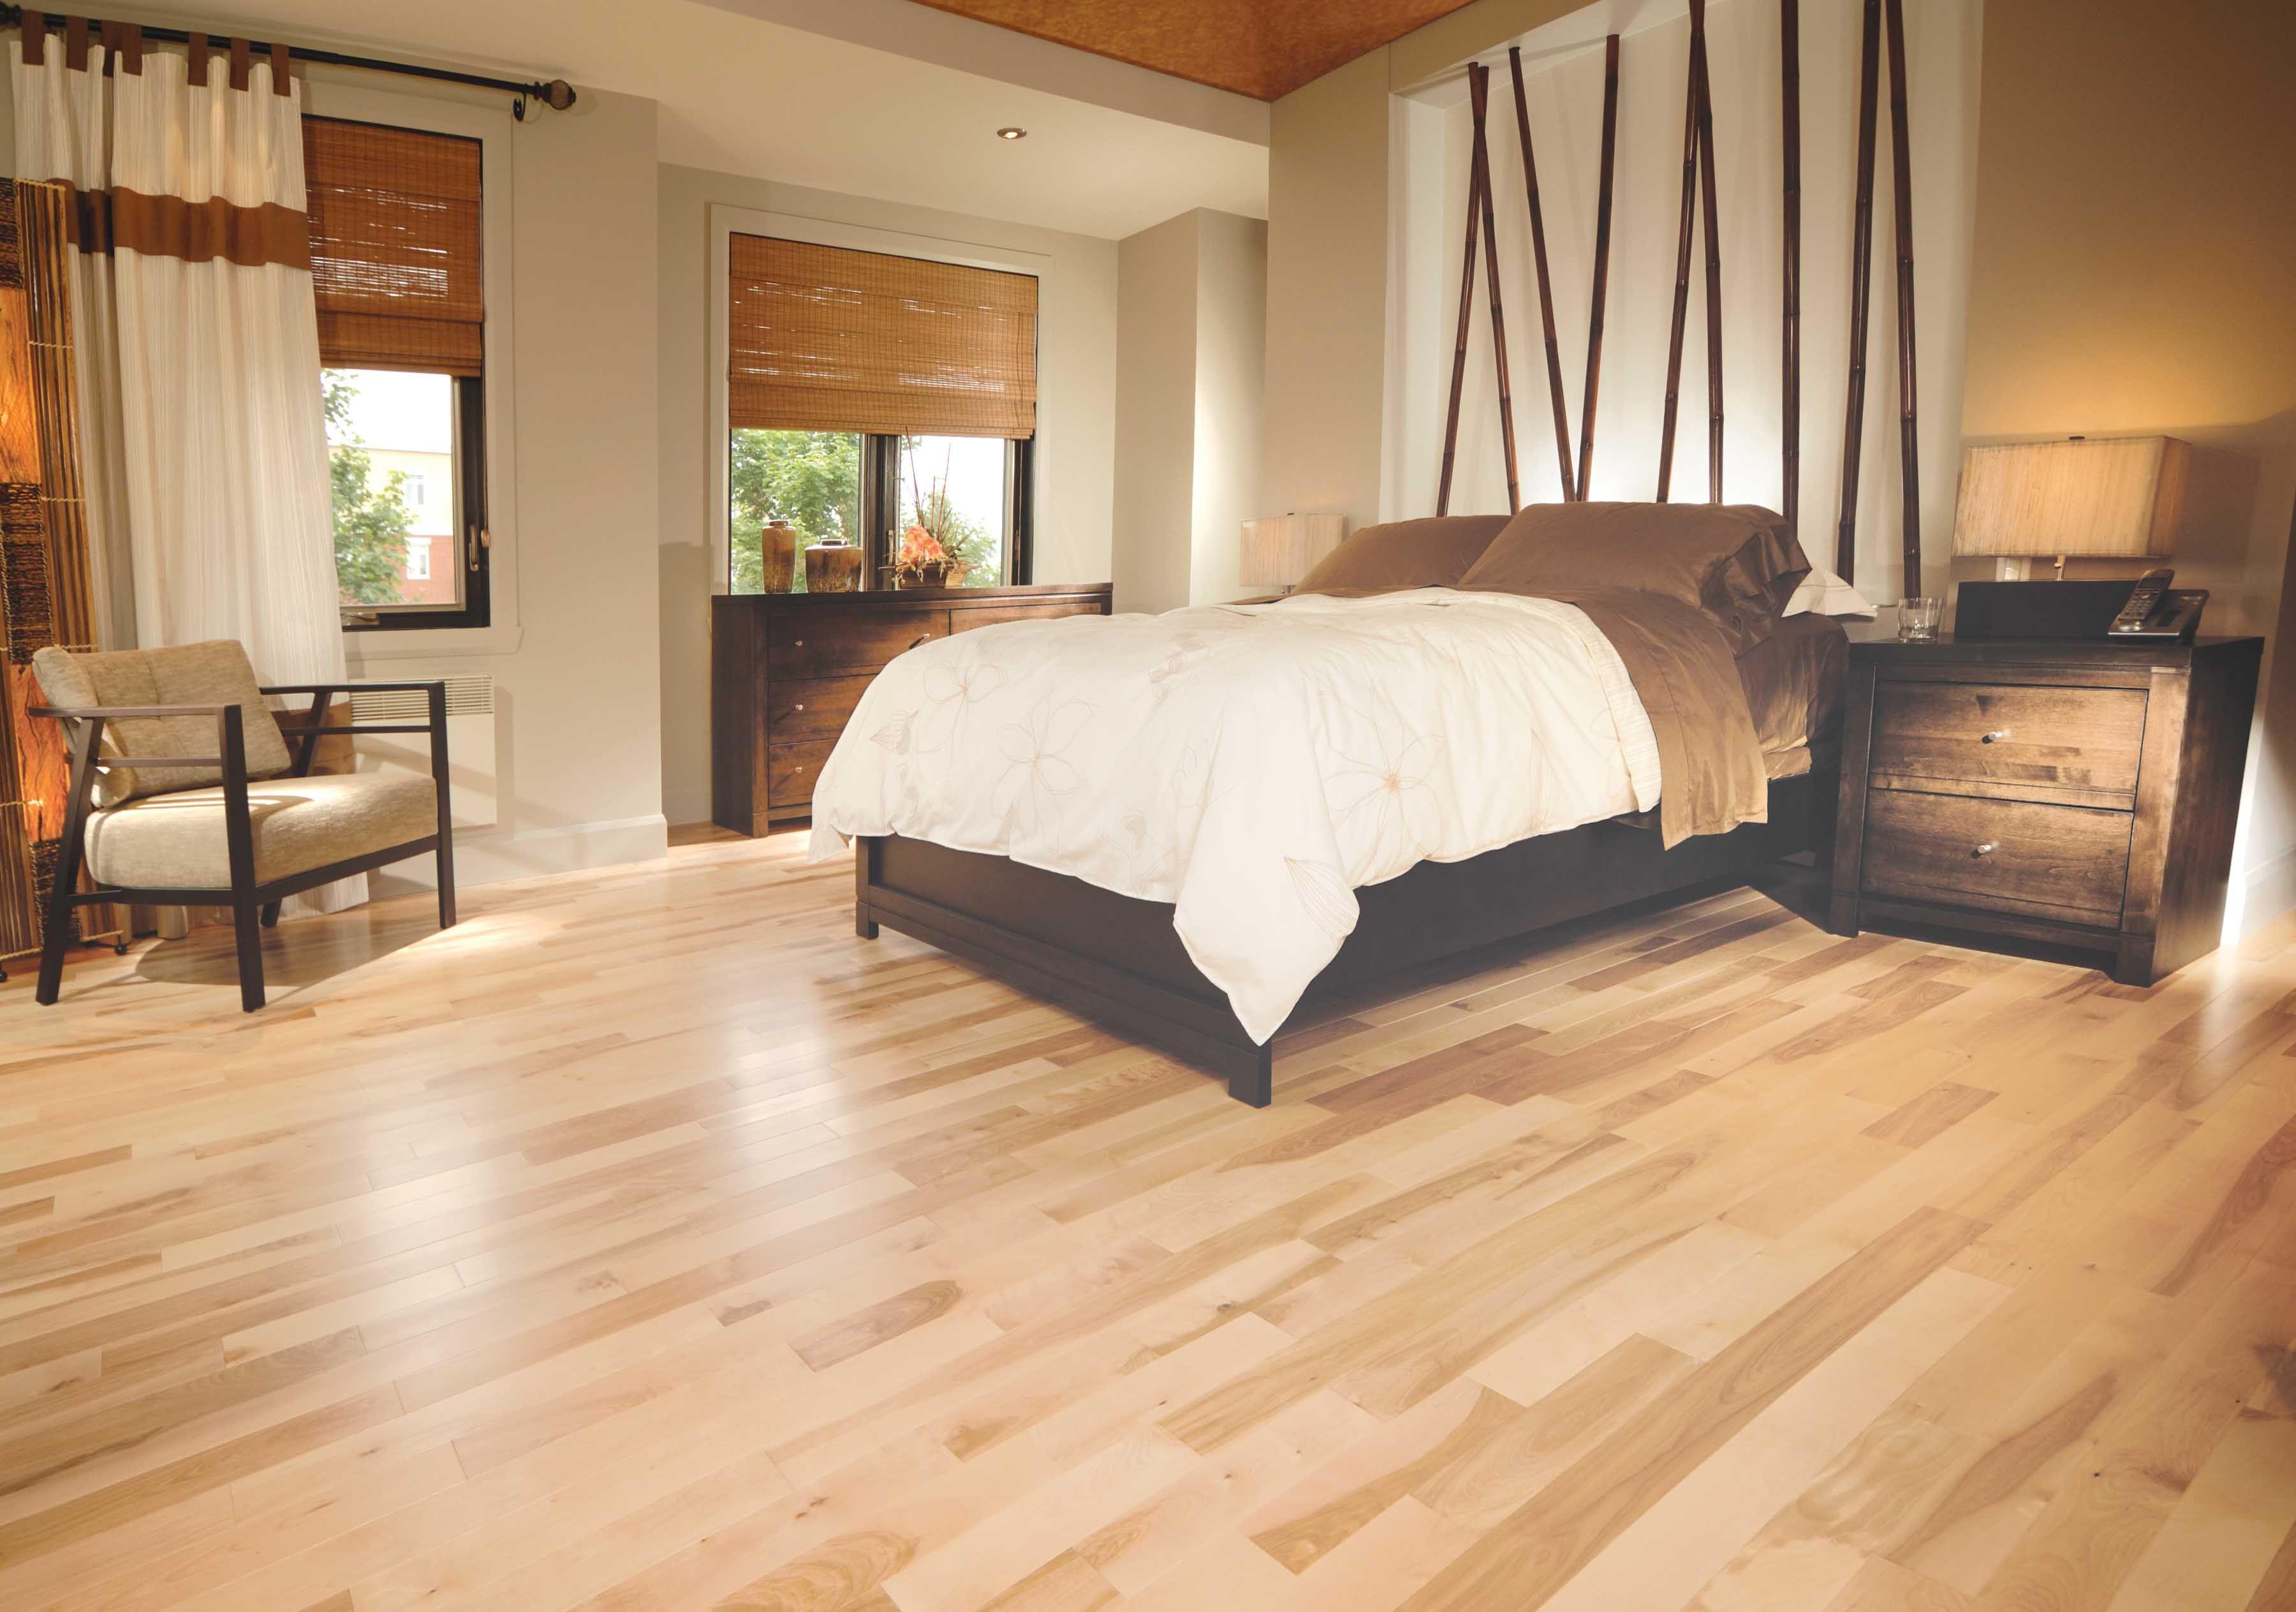 Mirage Hardwood Floors Yellow Birch Exclusive Birch Hardwood Floors Hardwood Bedroom Hardwood Floors